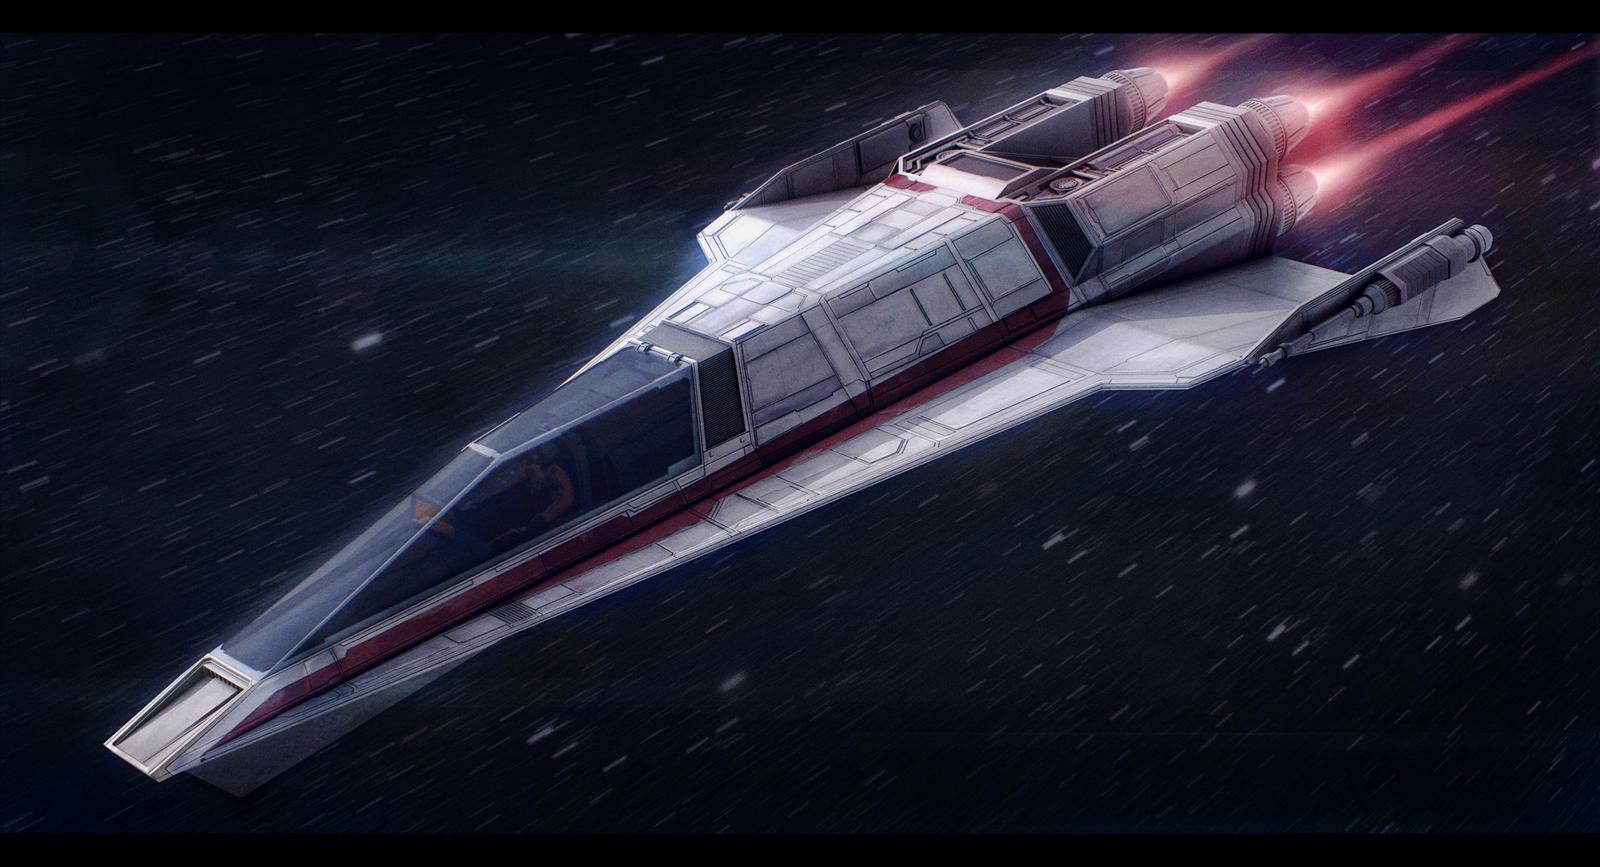 Star Wars Incom T-85 Fighter by AdamKop